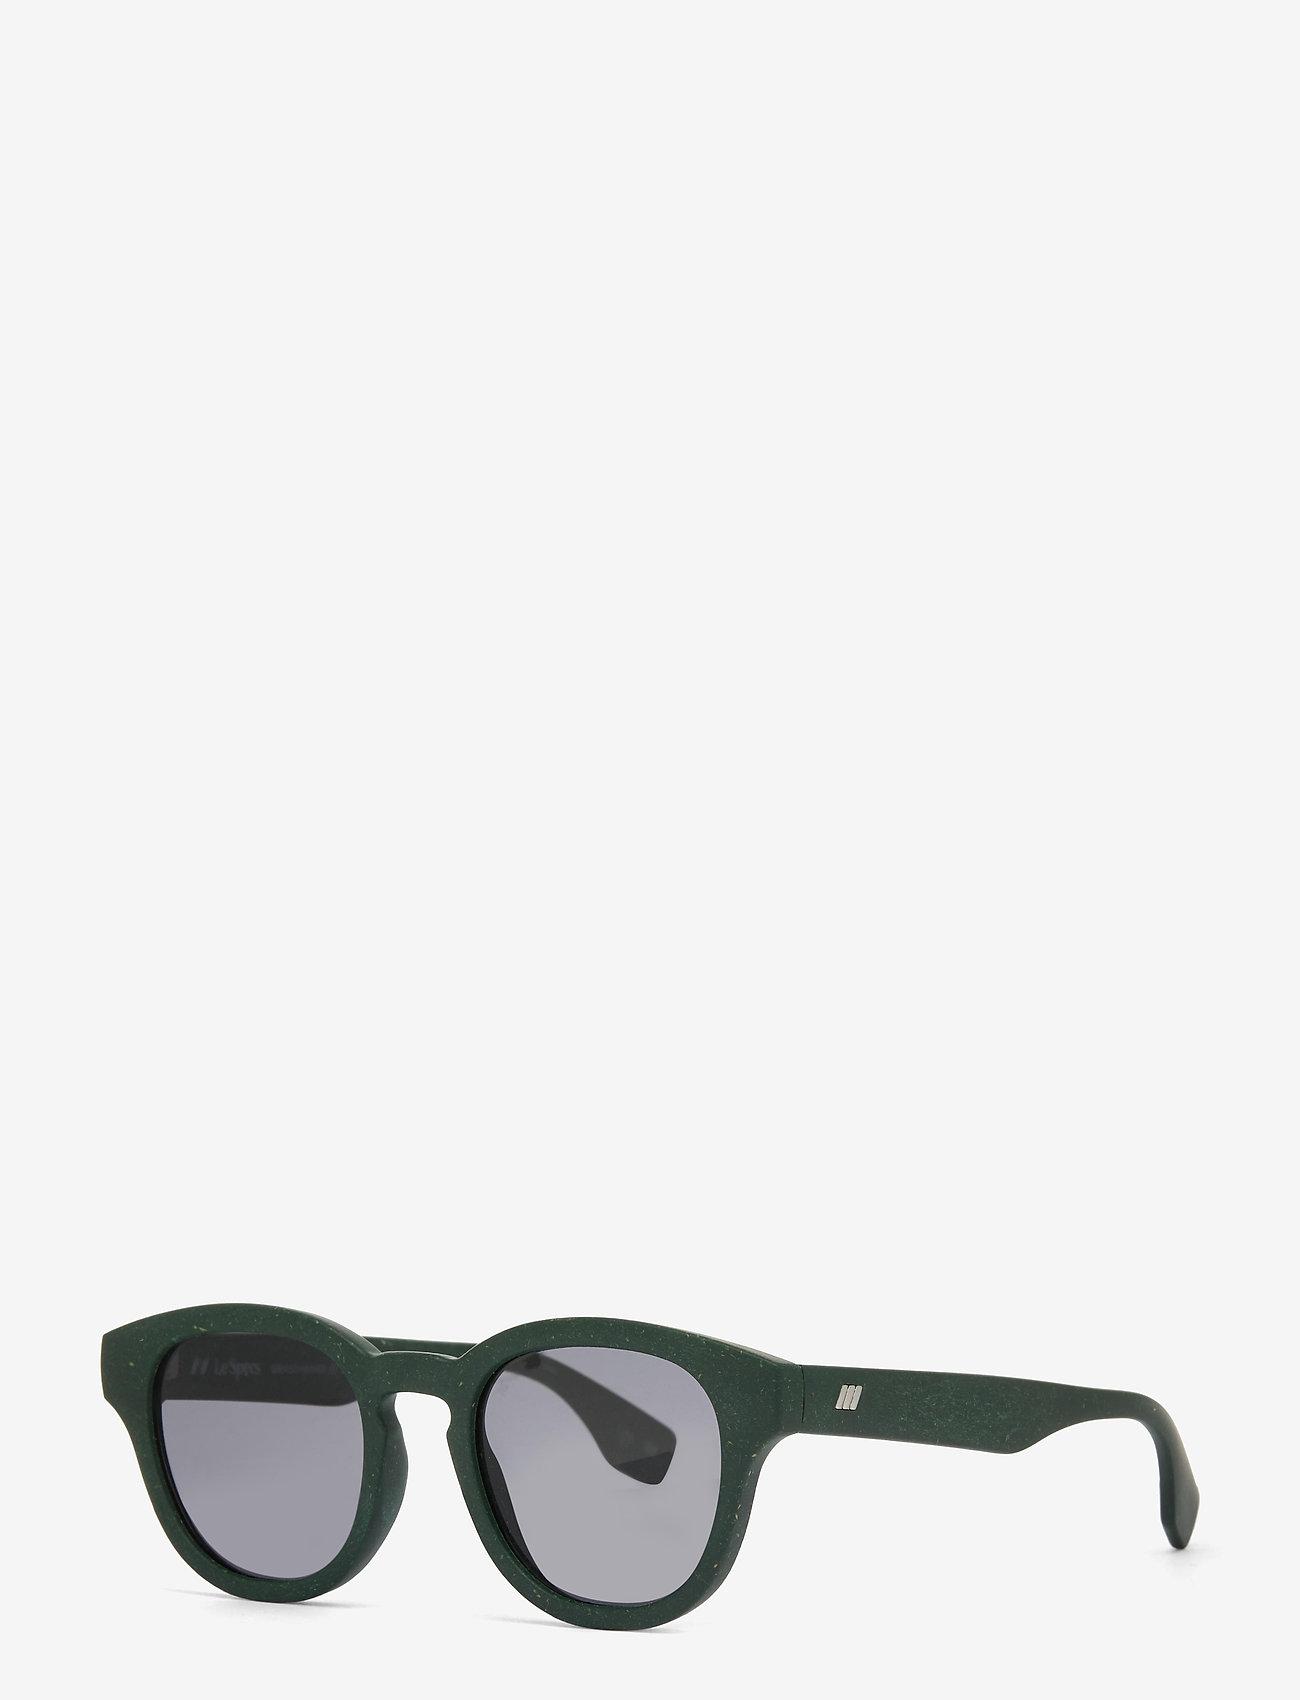 Le Specs - LE SUSTAIN - GRASS BAND - rond model - khaki grass w/ smoke mono lens - 1